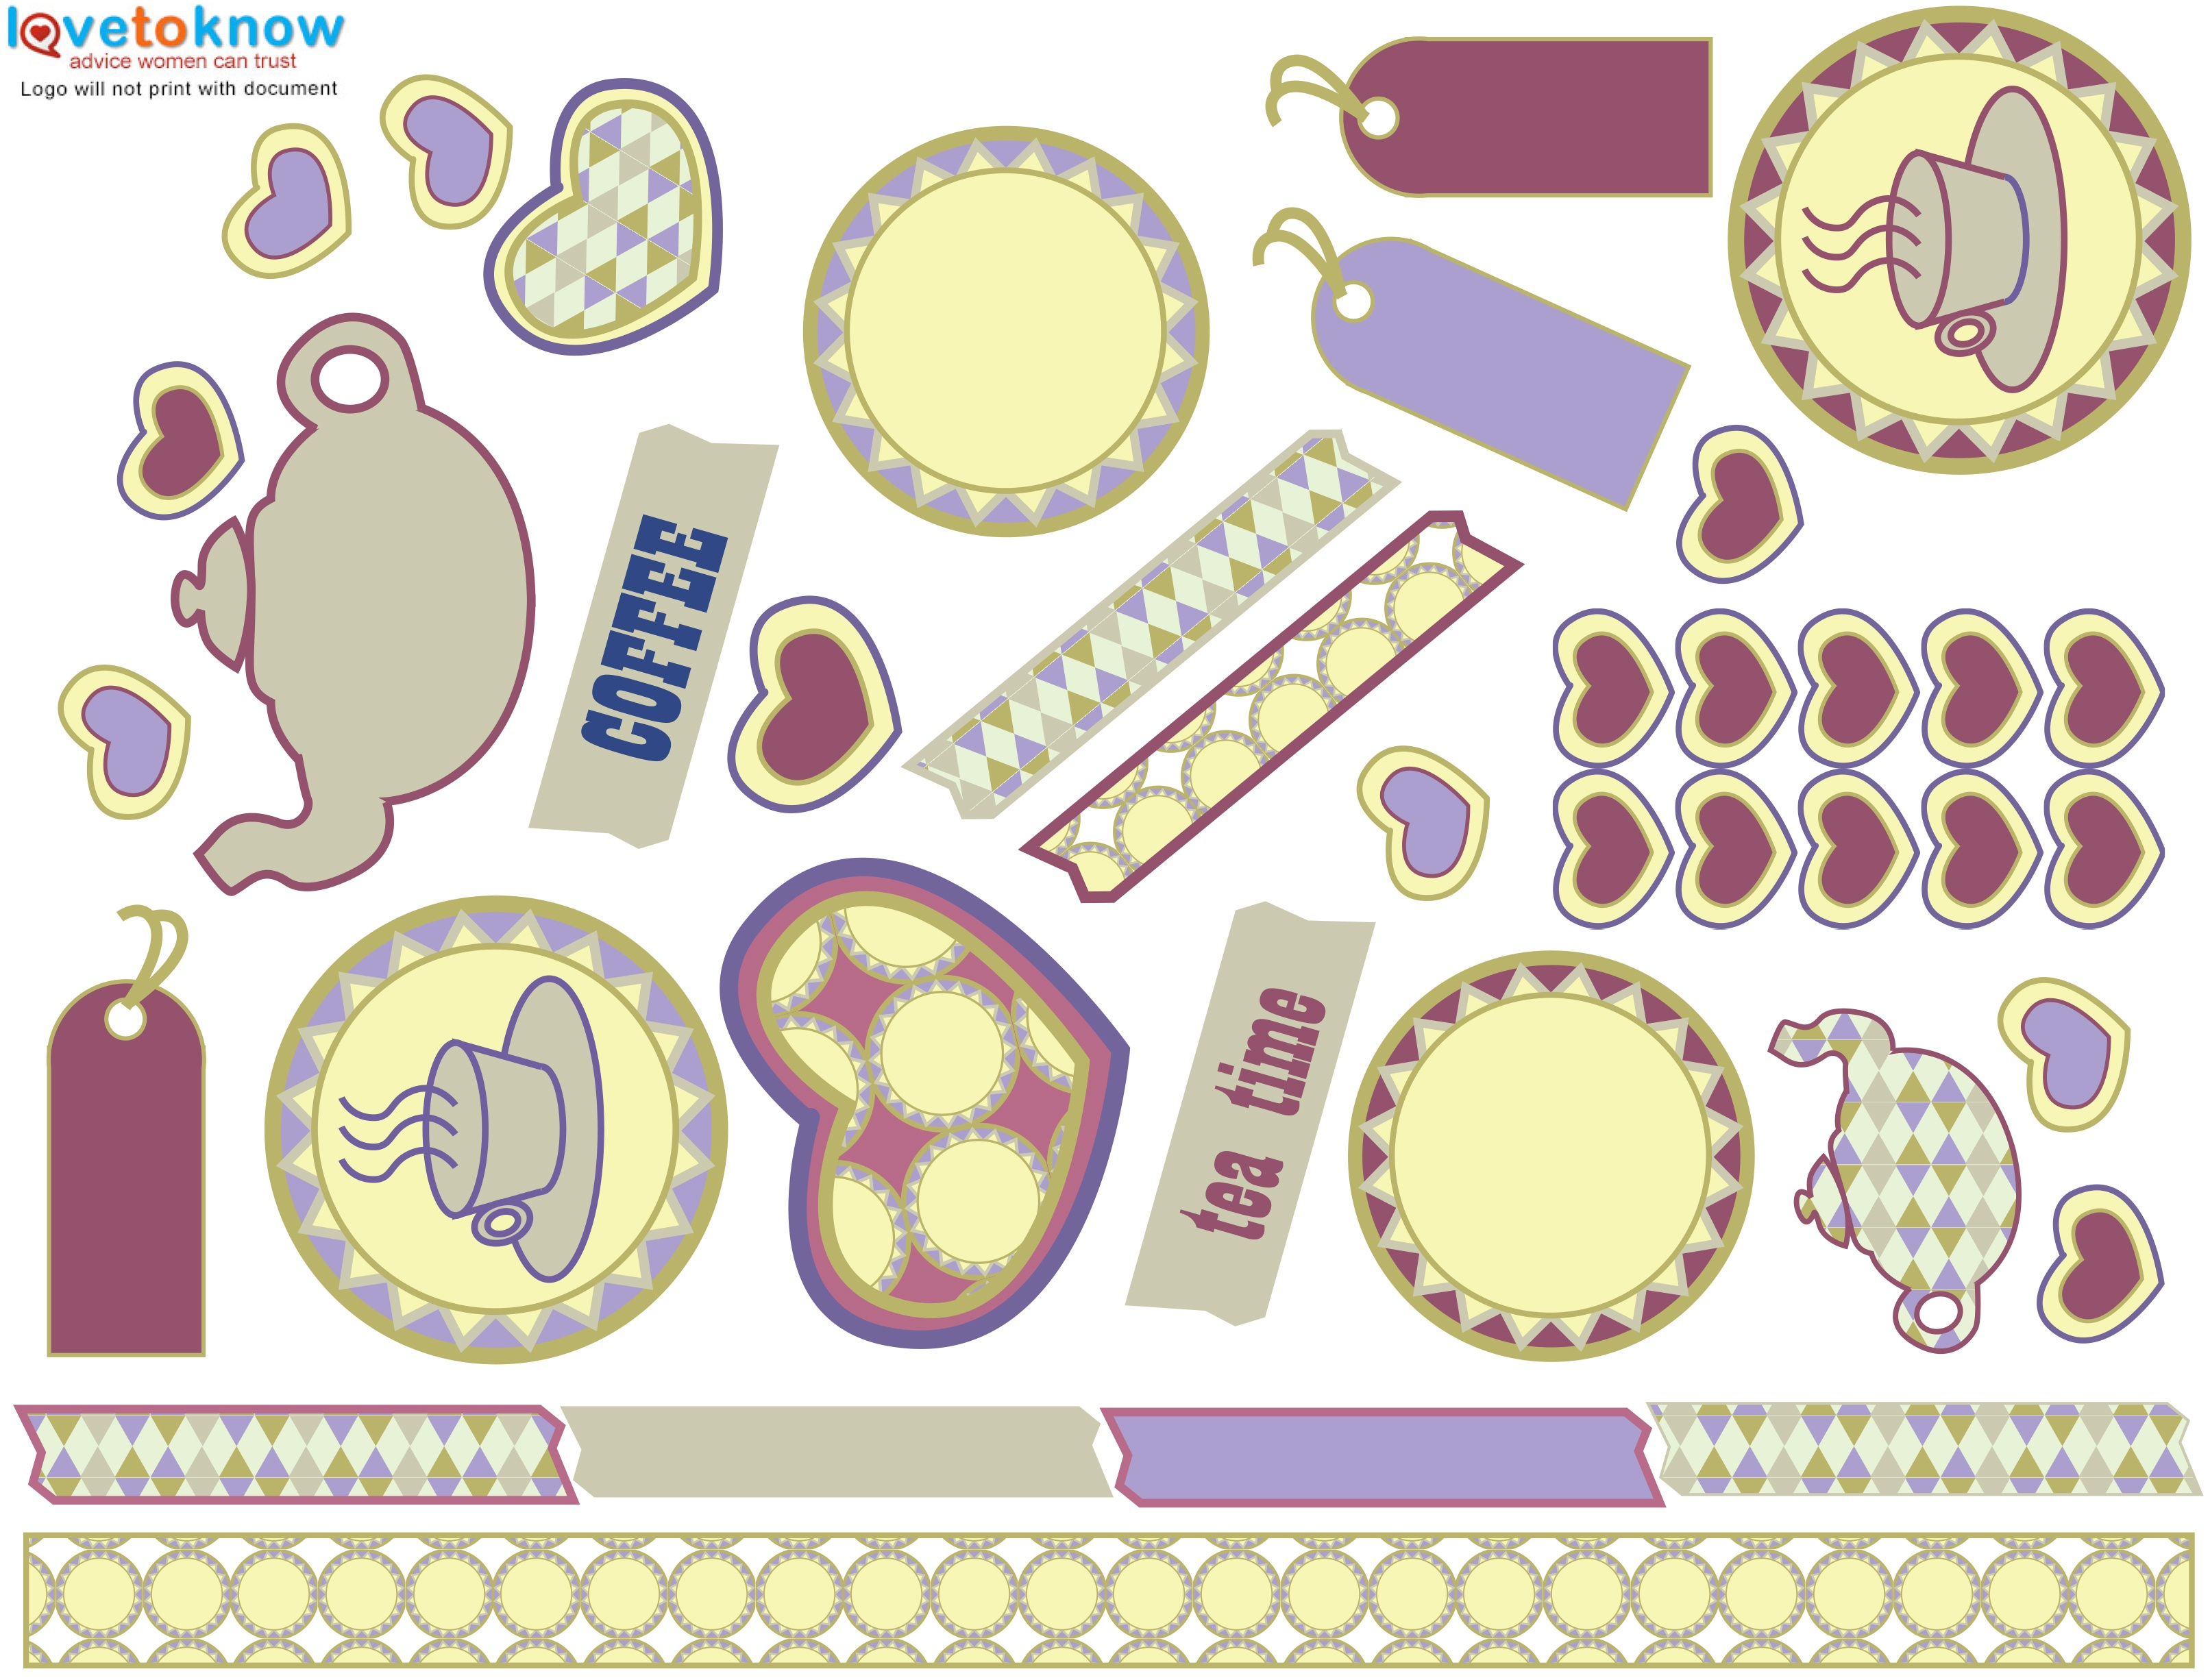 Free Printable Scrapbooking Stuff | Lovetoknow - Free Printable Scrapbook Decorations